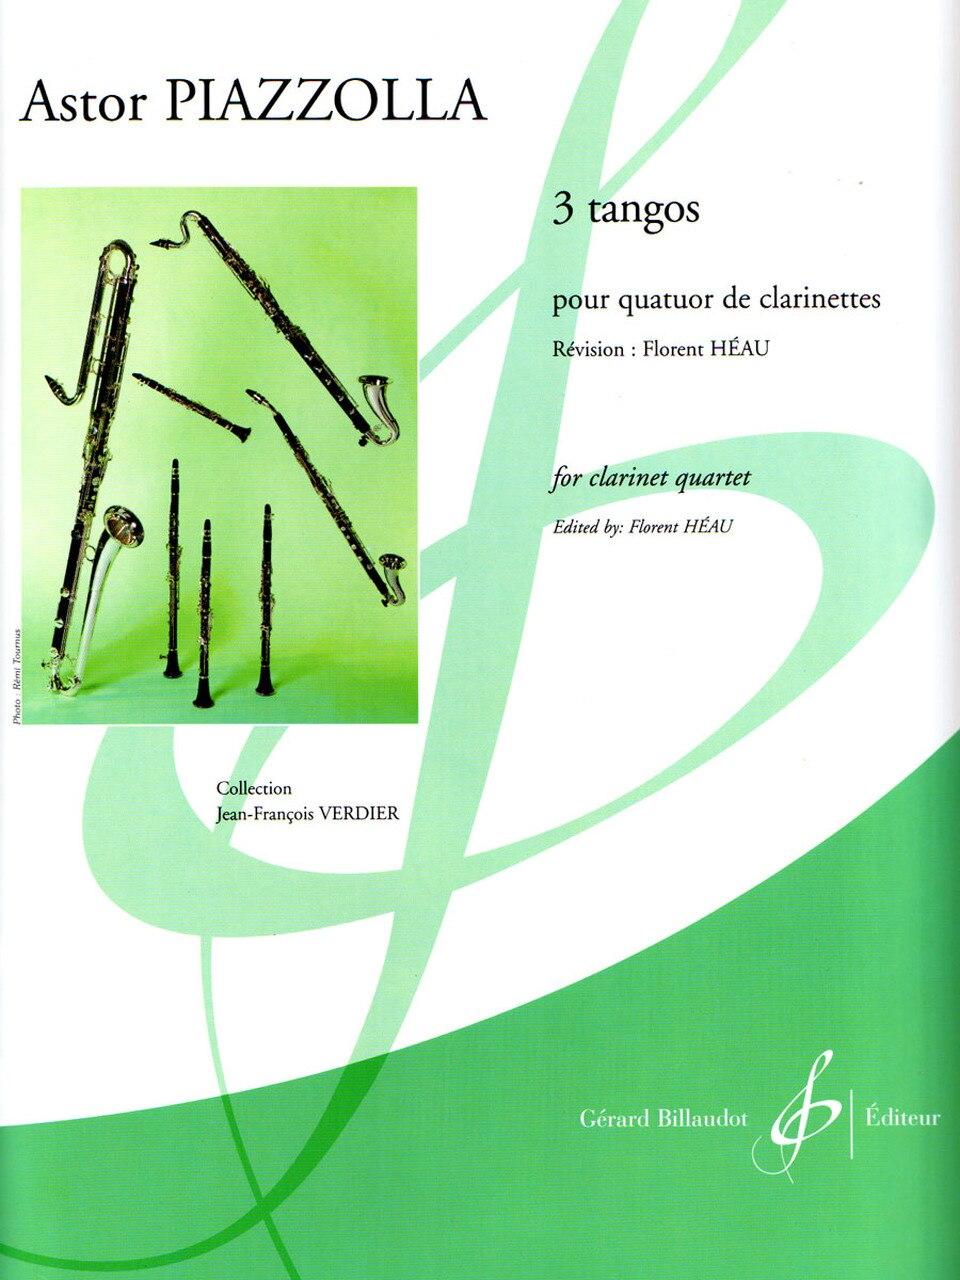 DreiTangospara clarinete. AstorPiazzolla